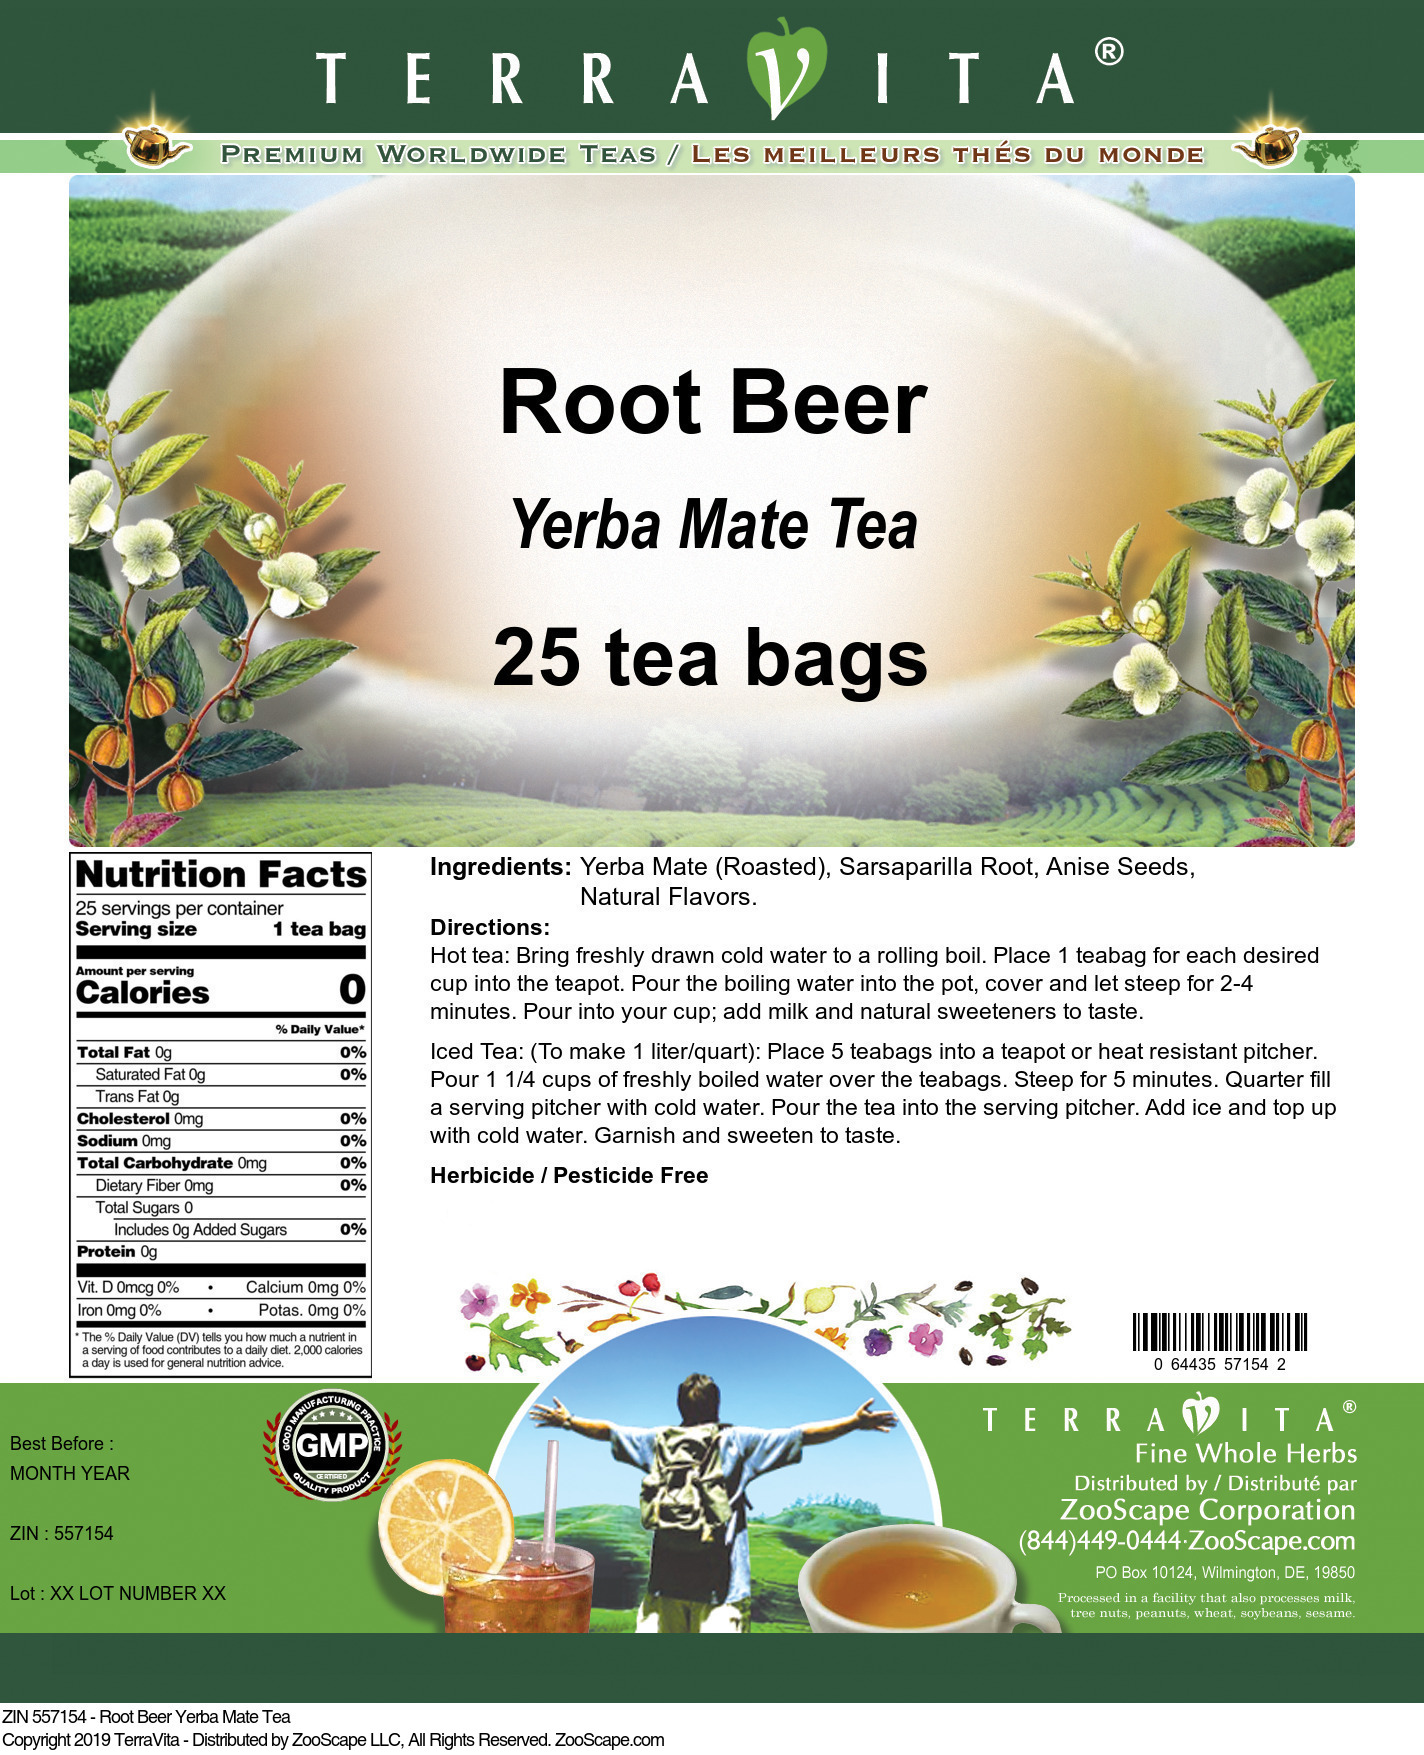 Root Beer Yerba Mate Tea